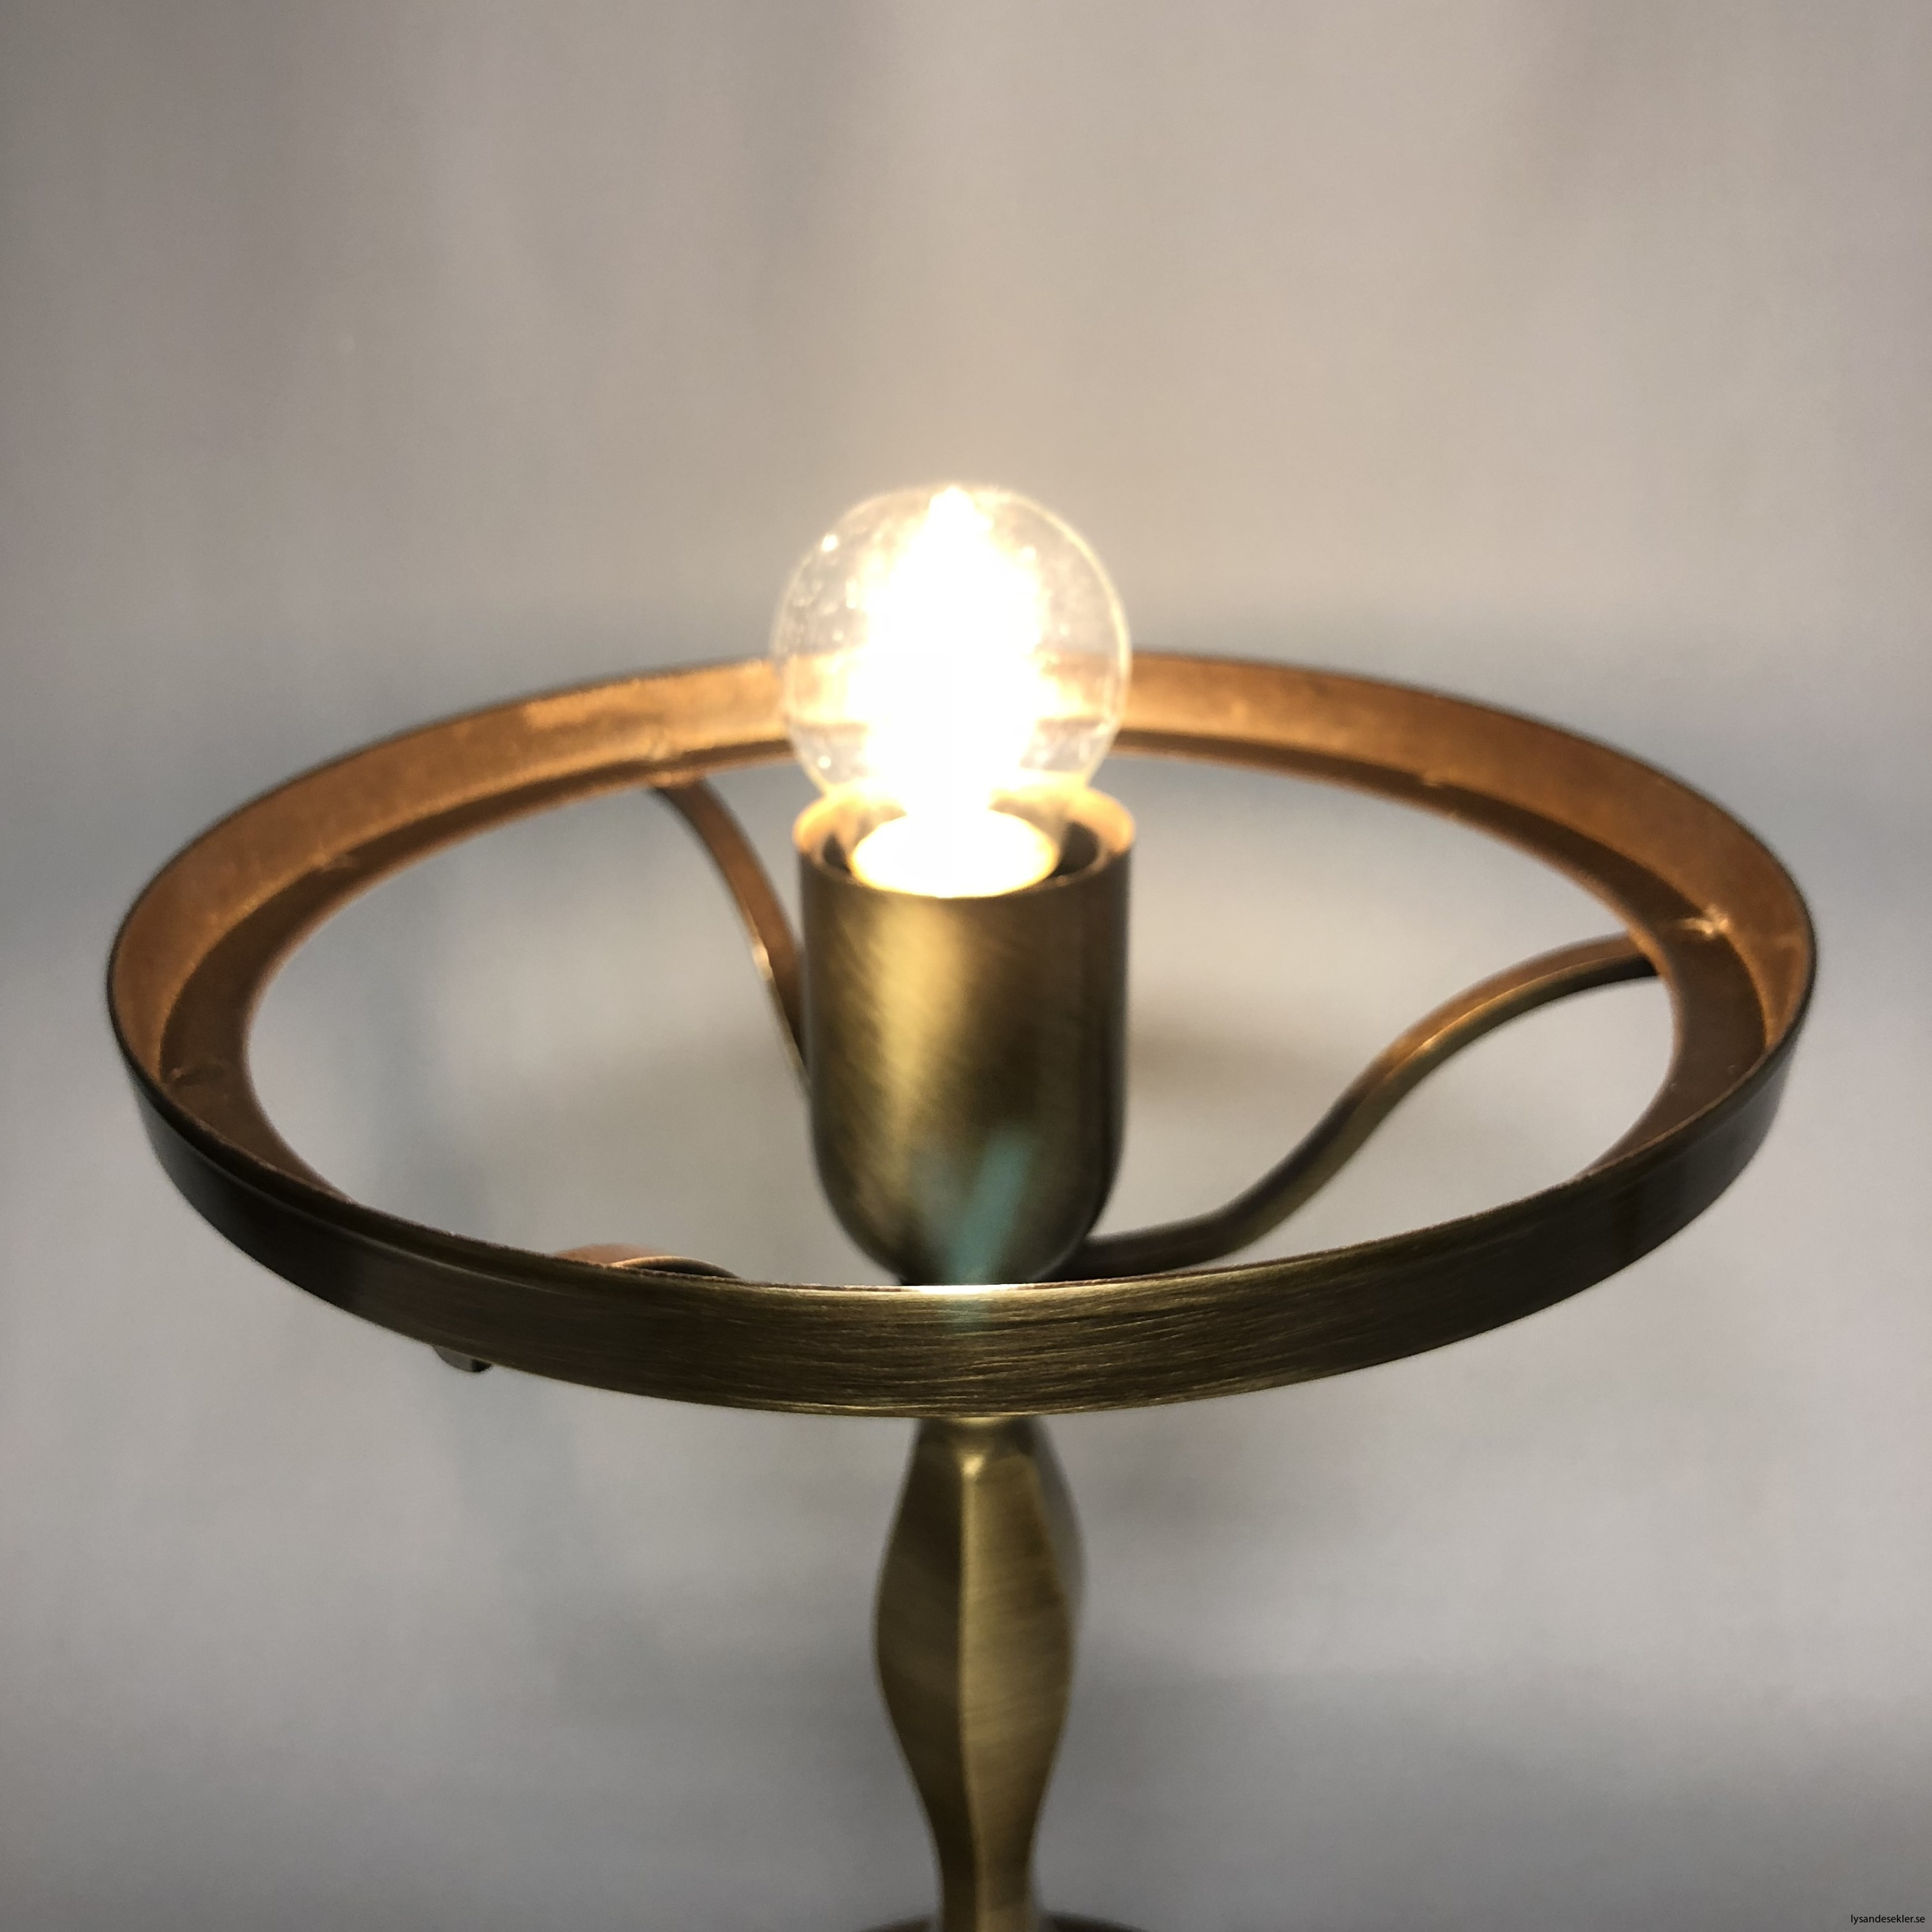 strindbergslampa strindbergslampor strindberg lampa skärm kupa strindbergsskärm strindbergskupa11